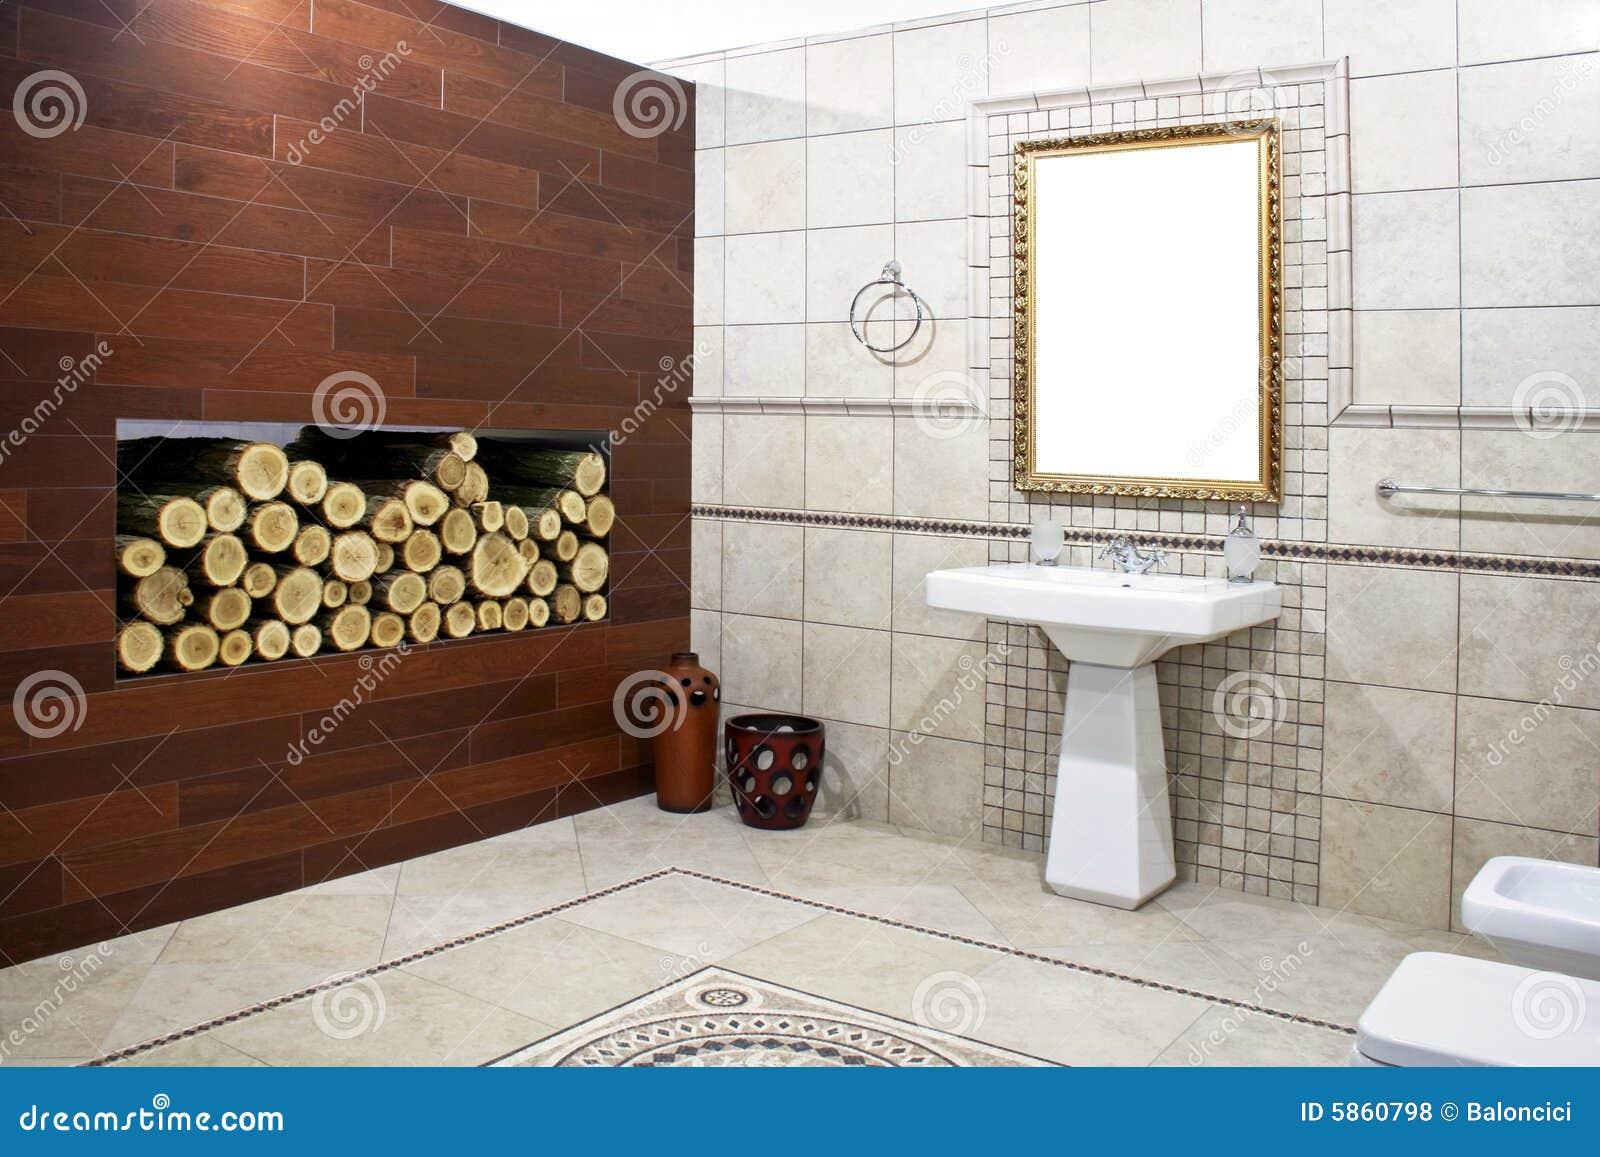 Italiaanse badkamers 2 royalty vrije stock foto 39 s beeld 5860798 - Italiaanse badkamer ...